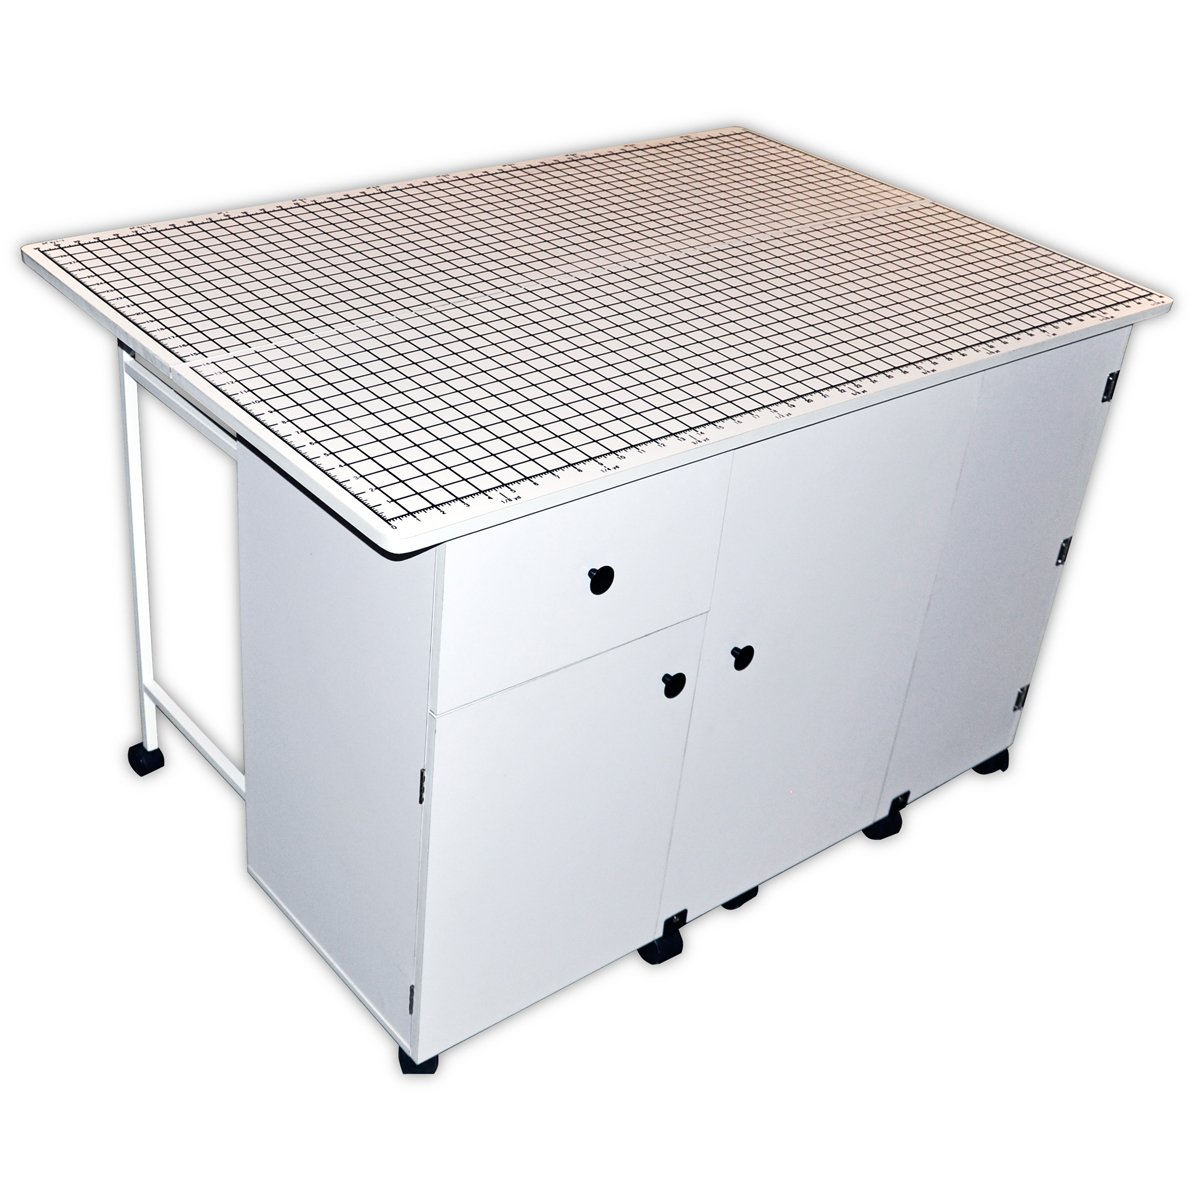 Sullivans Quilter's Design Table White